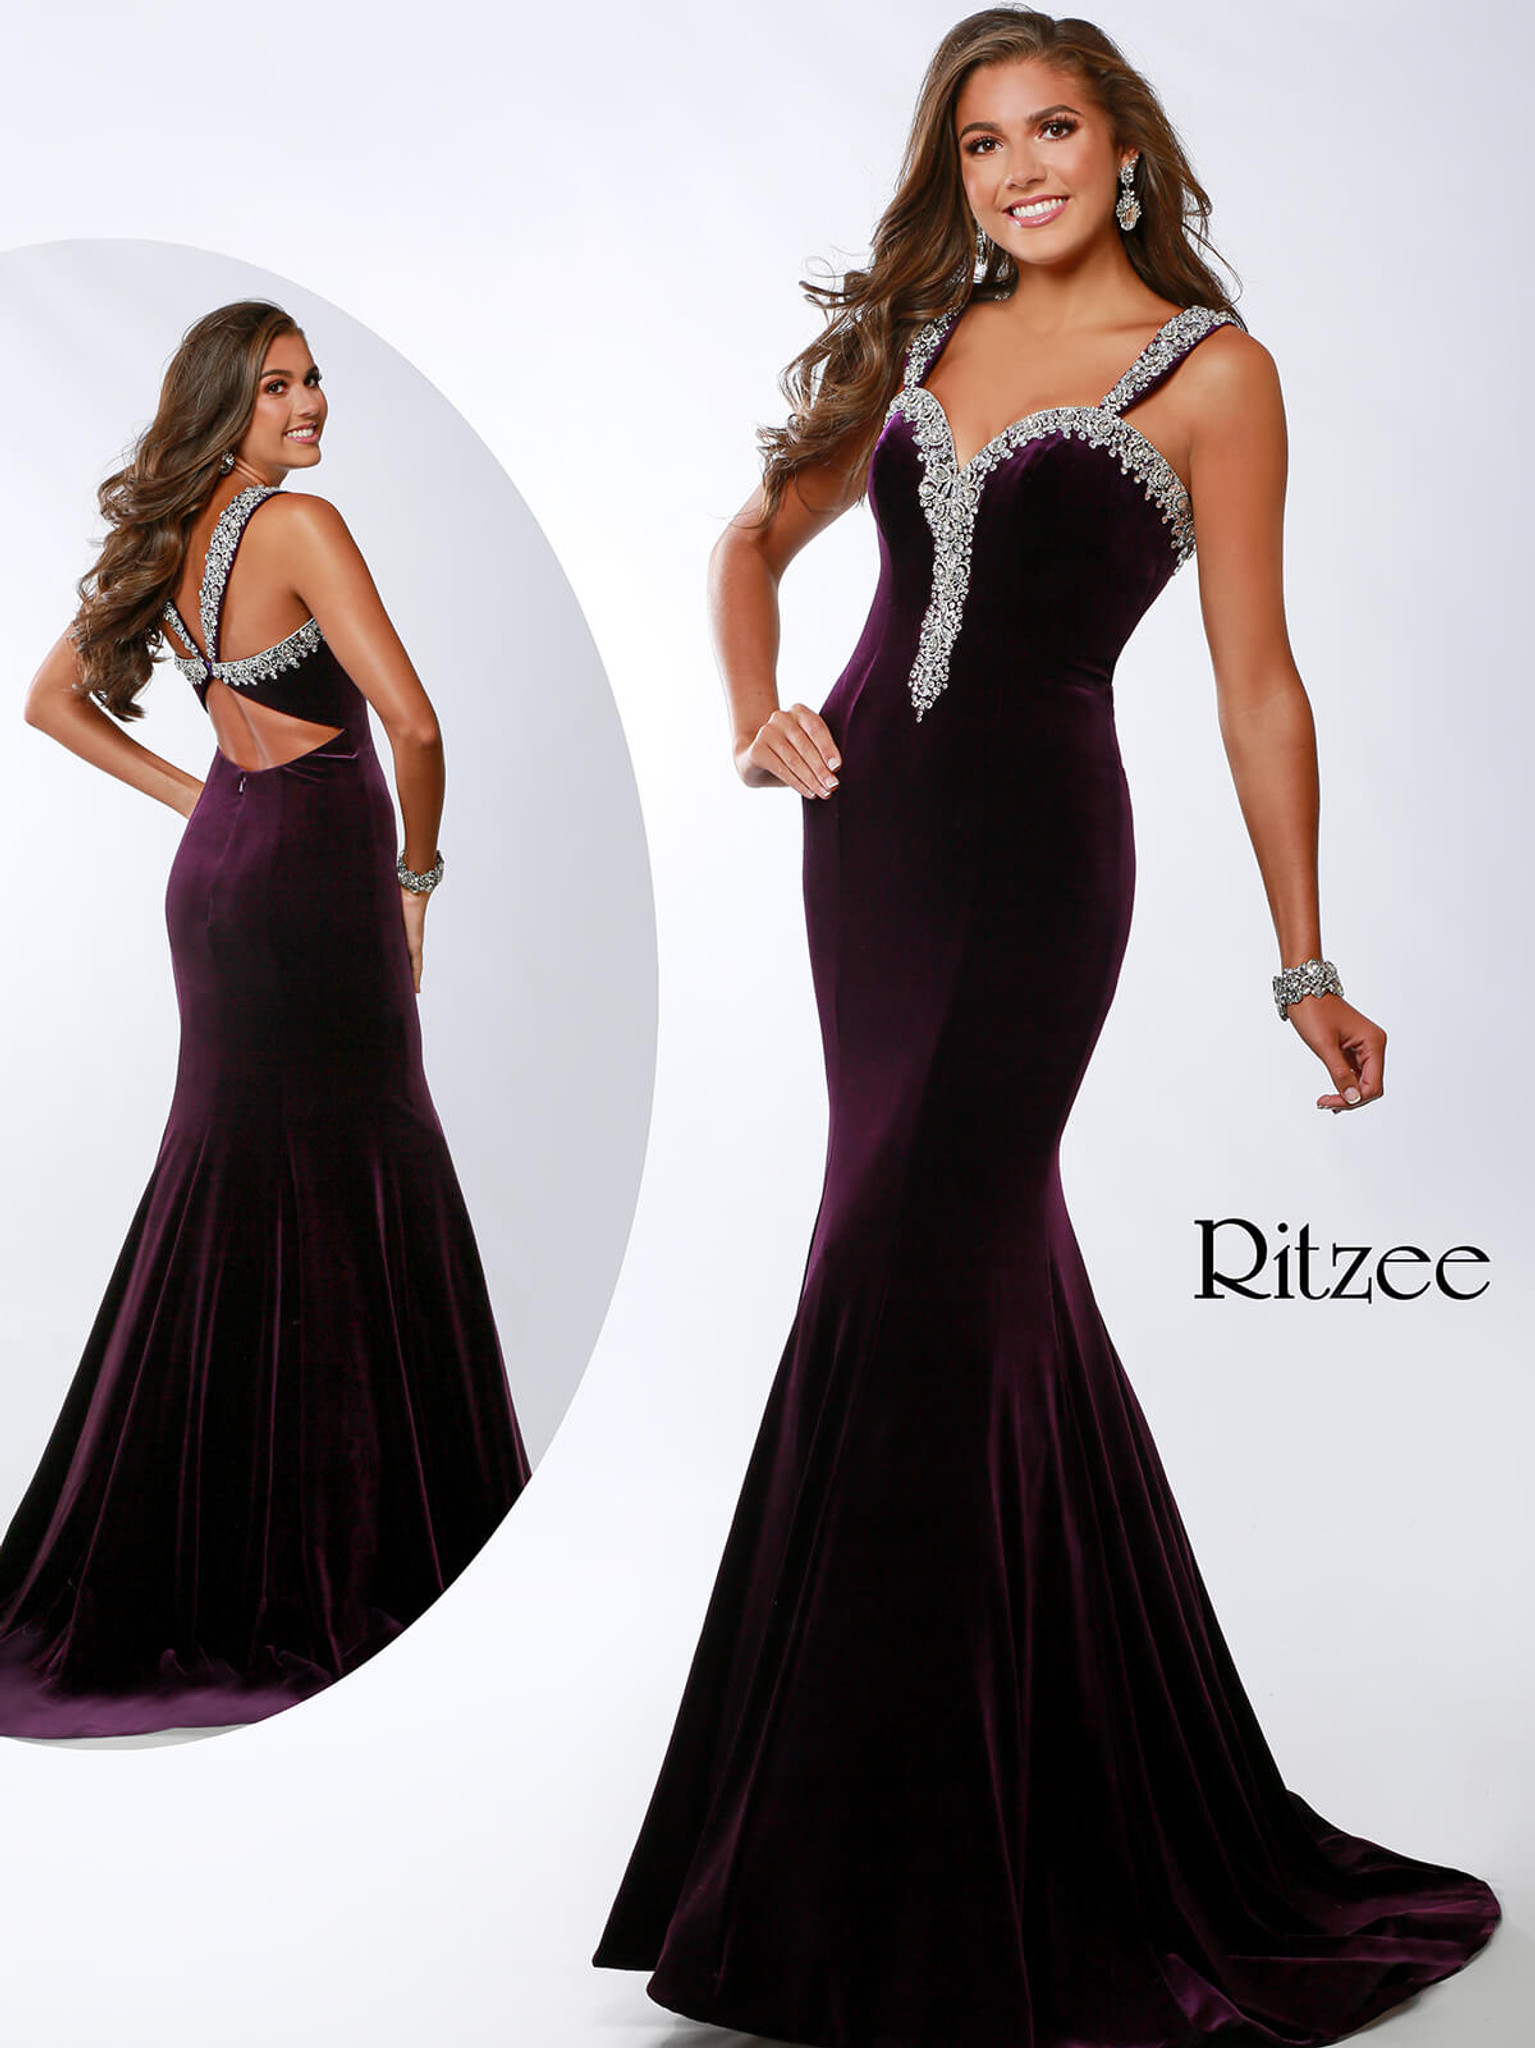 Sweetheart Ritzee Originals 3632 Pageant Dress PageantDesigns